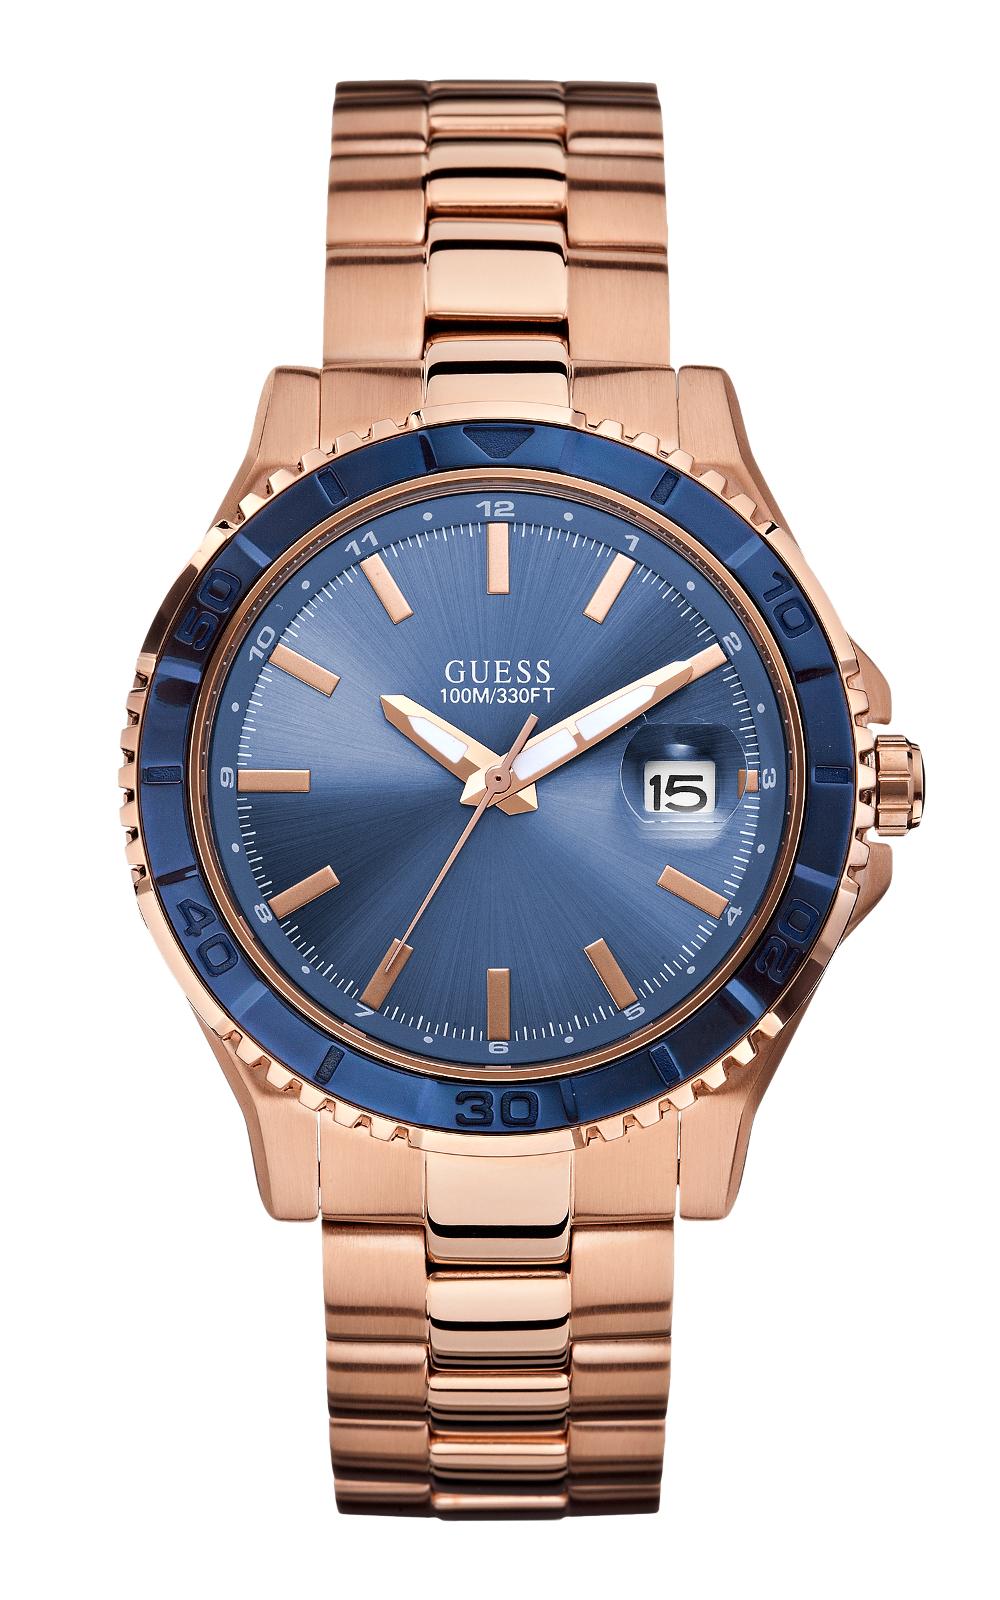 GUESS W0244G3 Ανδρικό Ρολόι Quartz Ακριβείας c77d4a316e6